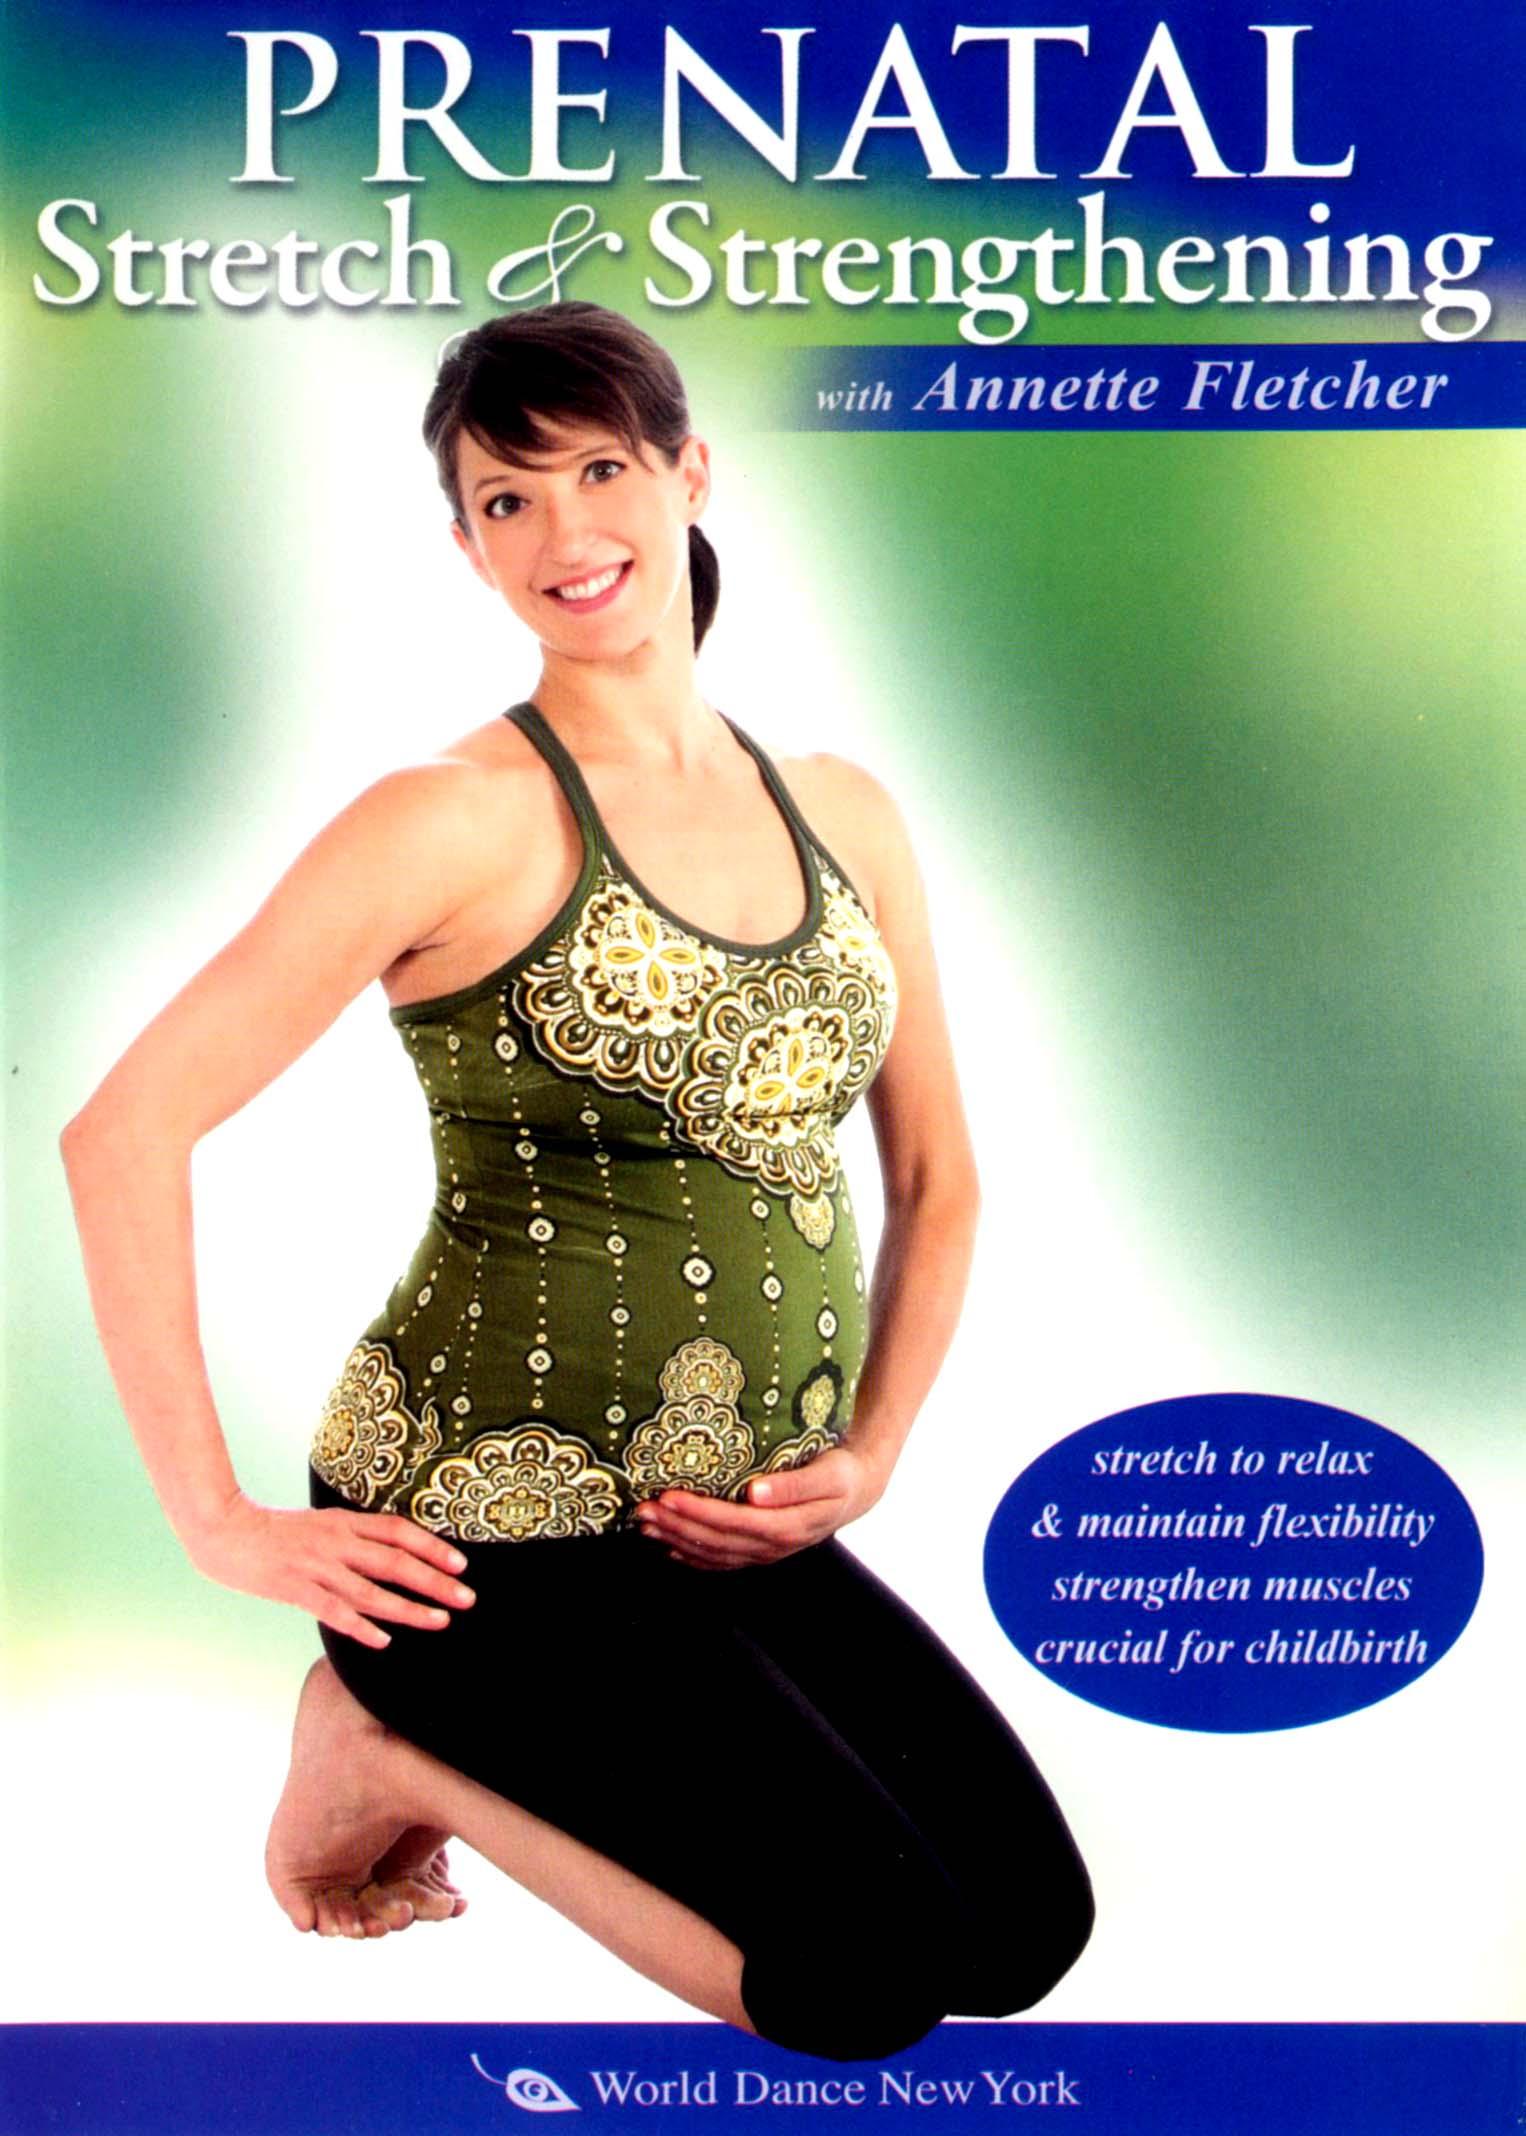 Annette Fletcher: Prenatal Stretch & Strengthening